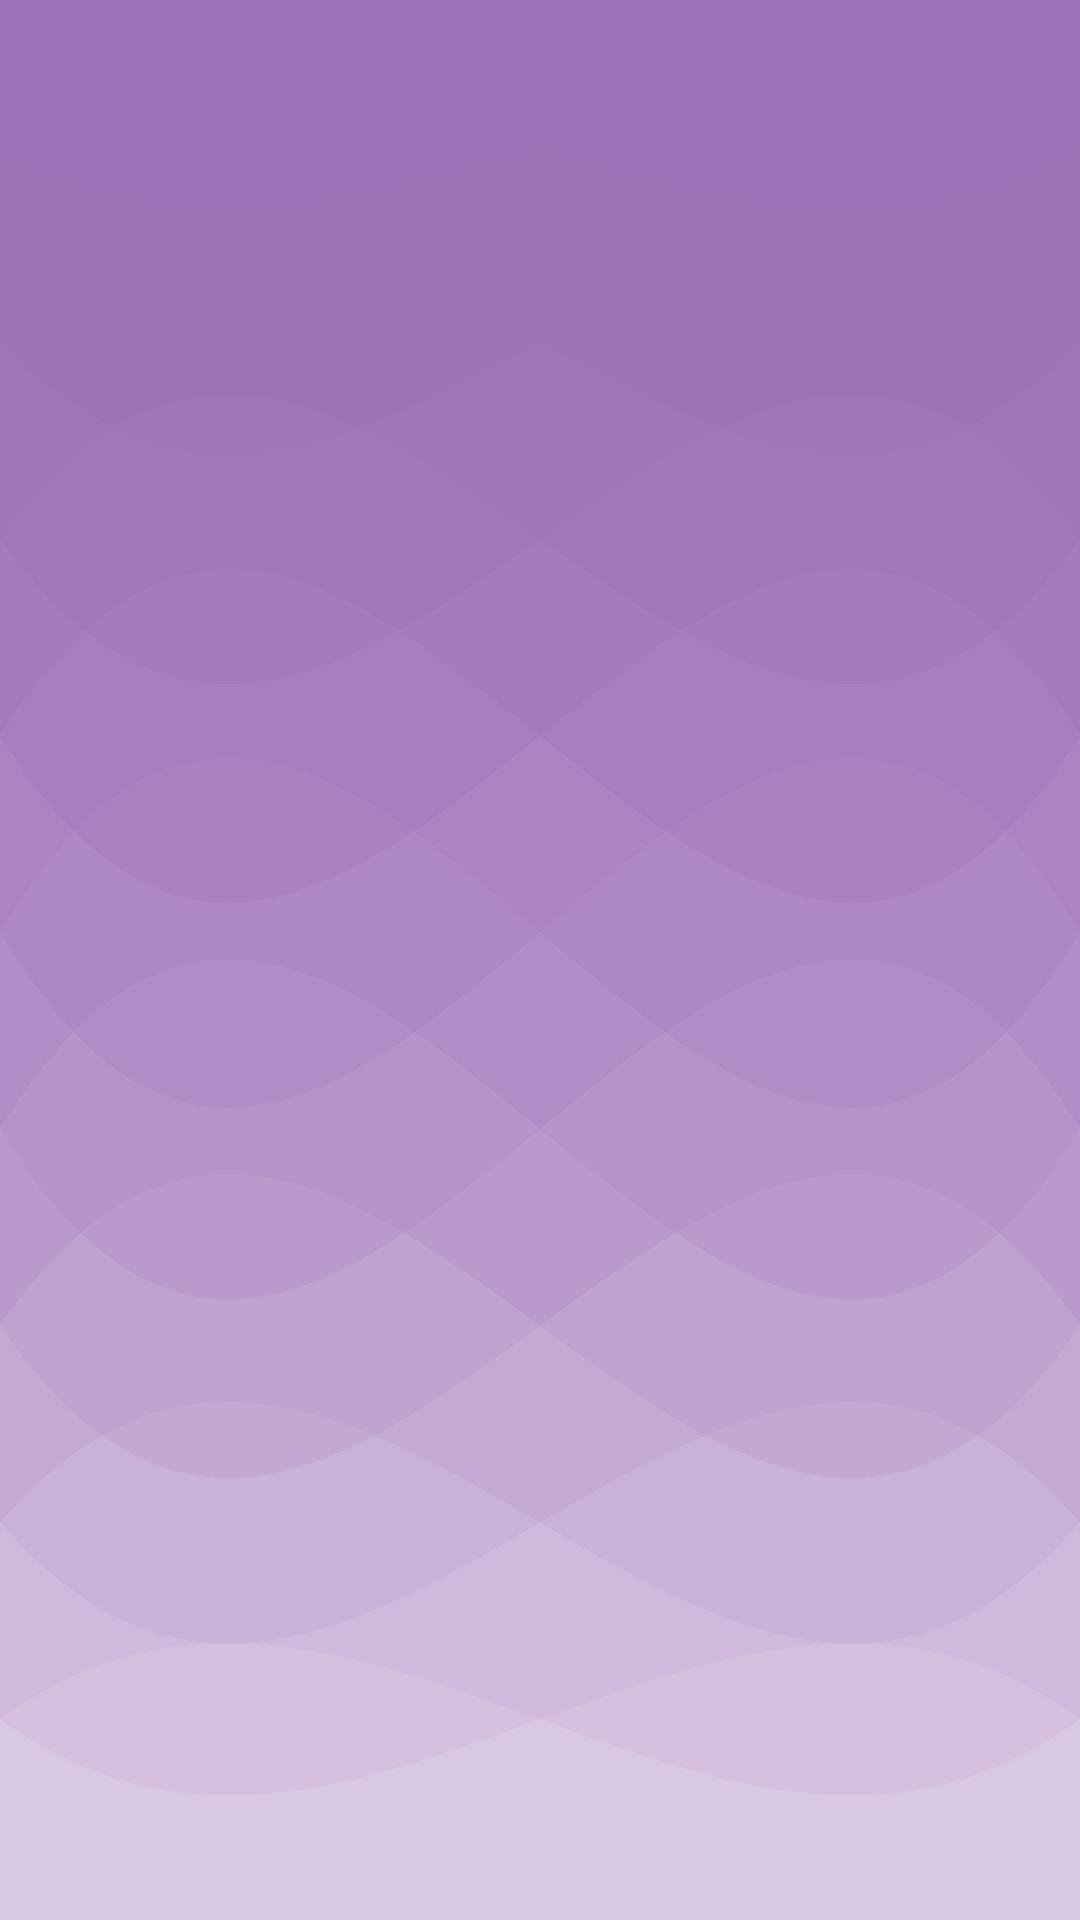 iphone7plus 1080x1920 wallpaper 00068